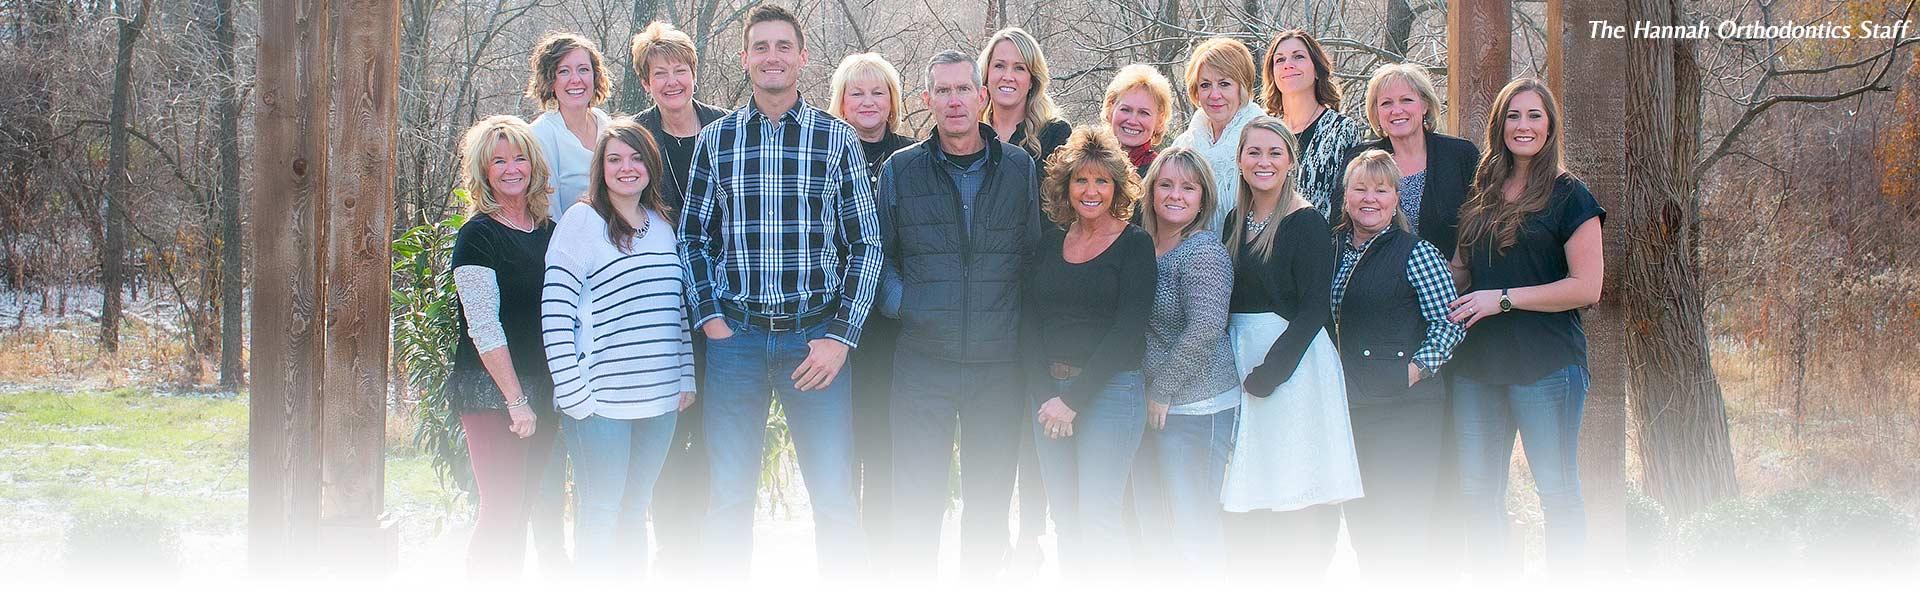 Hannah Practice Staff at Hannah Orthodontics in Olathe Emporia Lenexa/Shawnee Louisburg Kansas City, KS